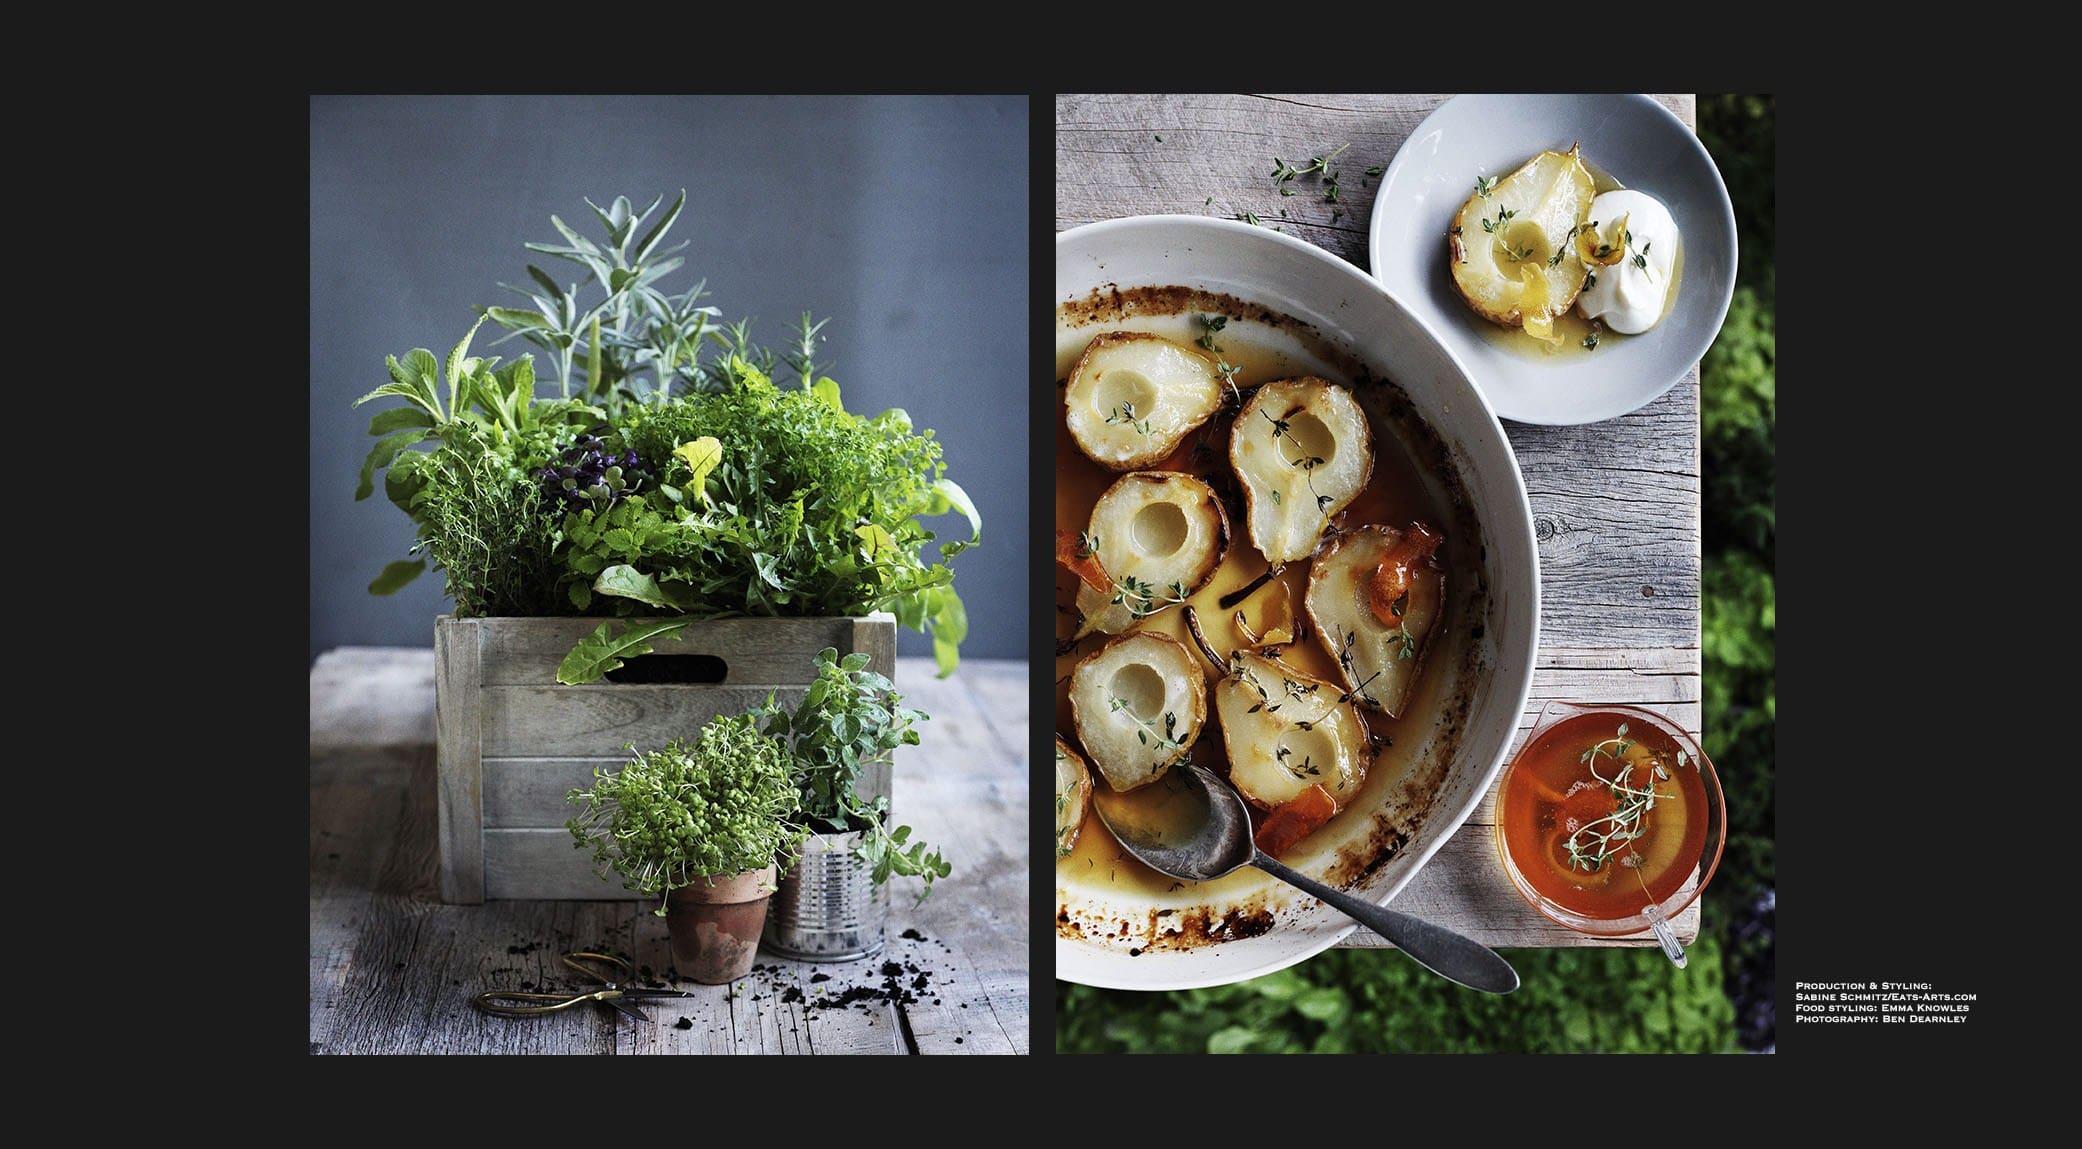 original_004-Wild-Herbs-copyright-Eats-Arts.jpg